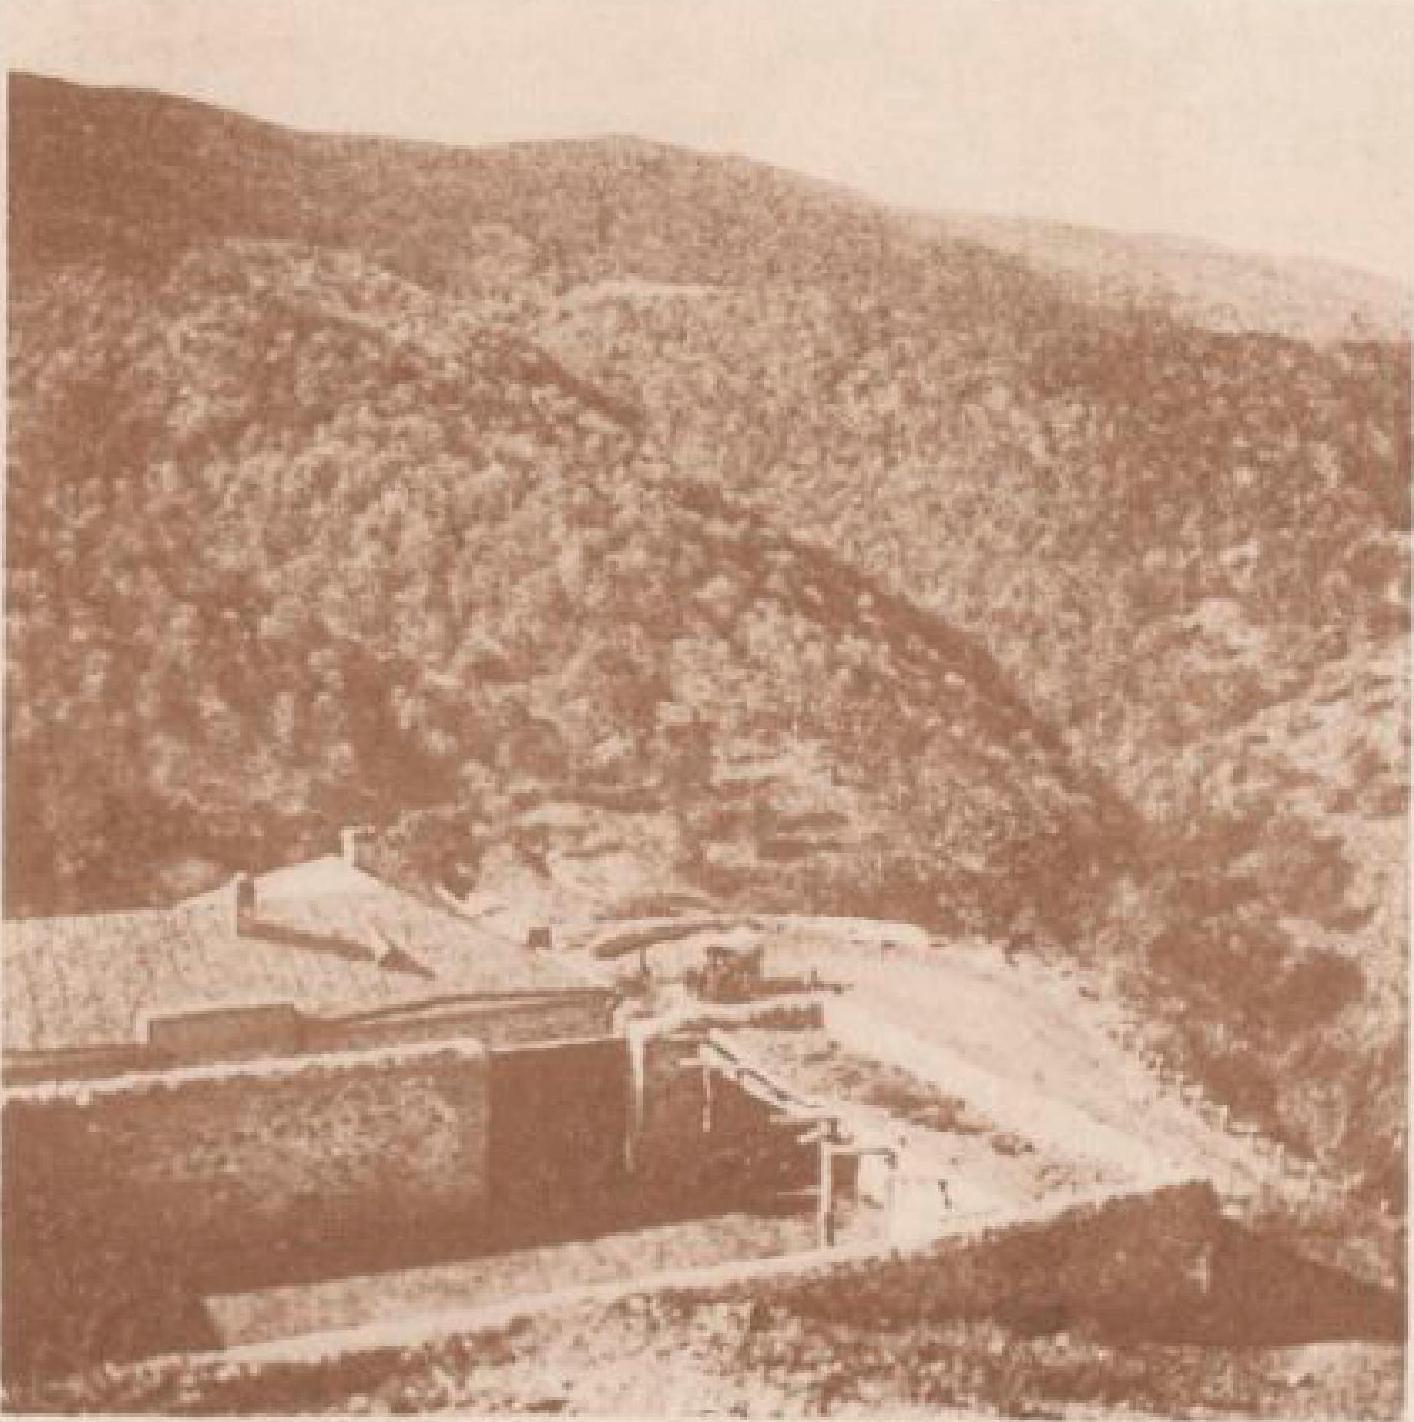 08. Чубучлы. Перевал. 24 октября 1897